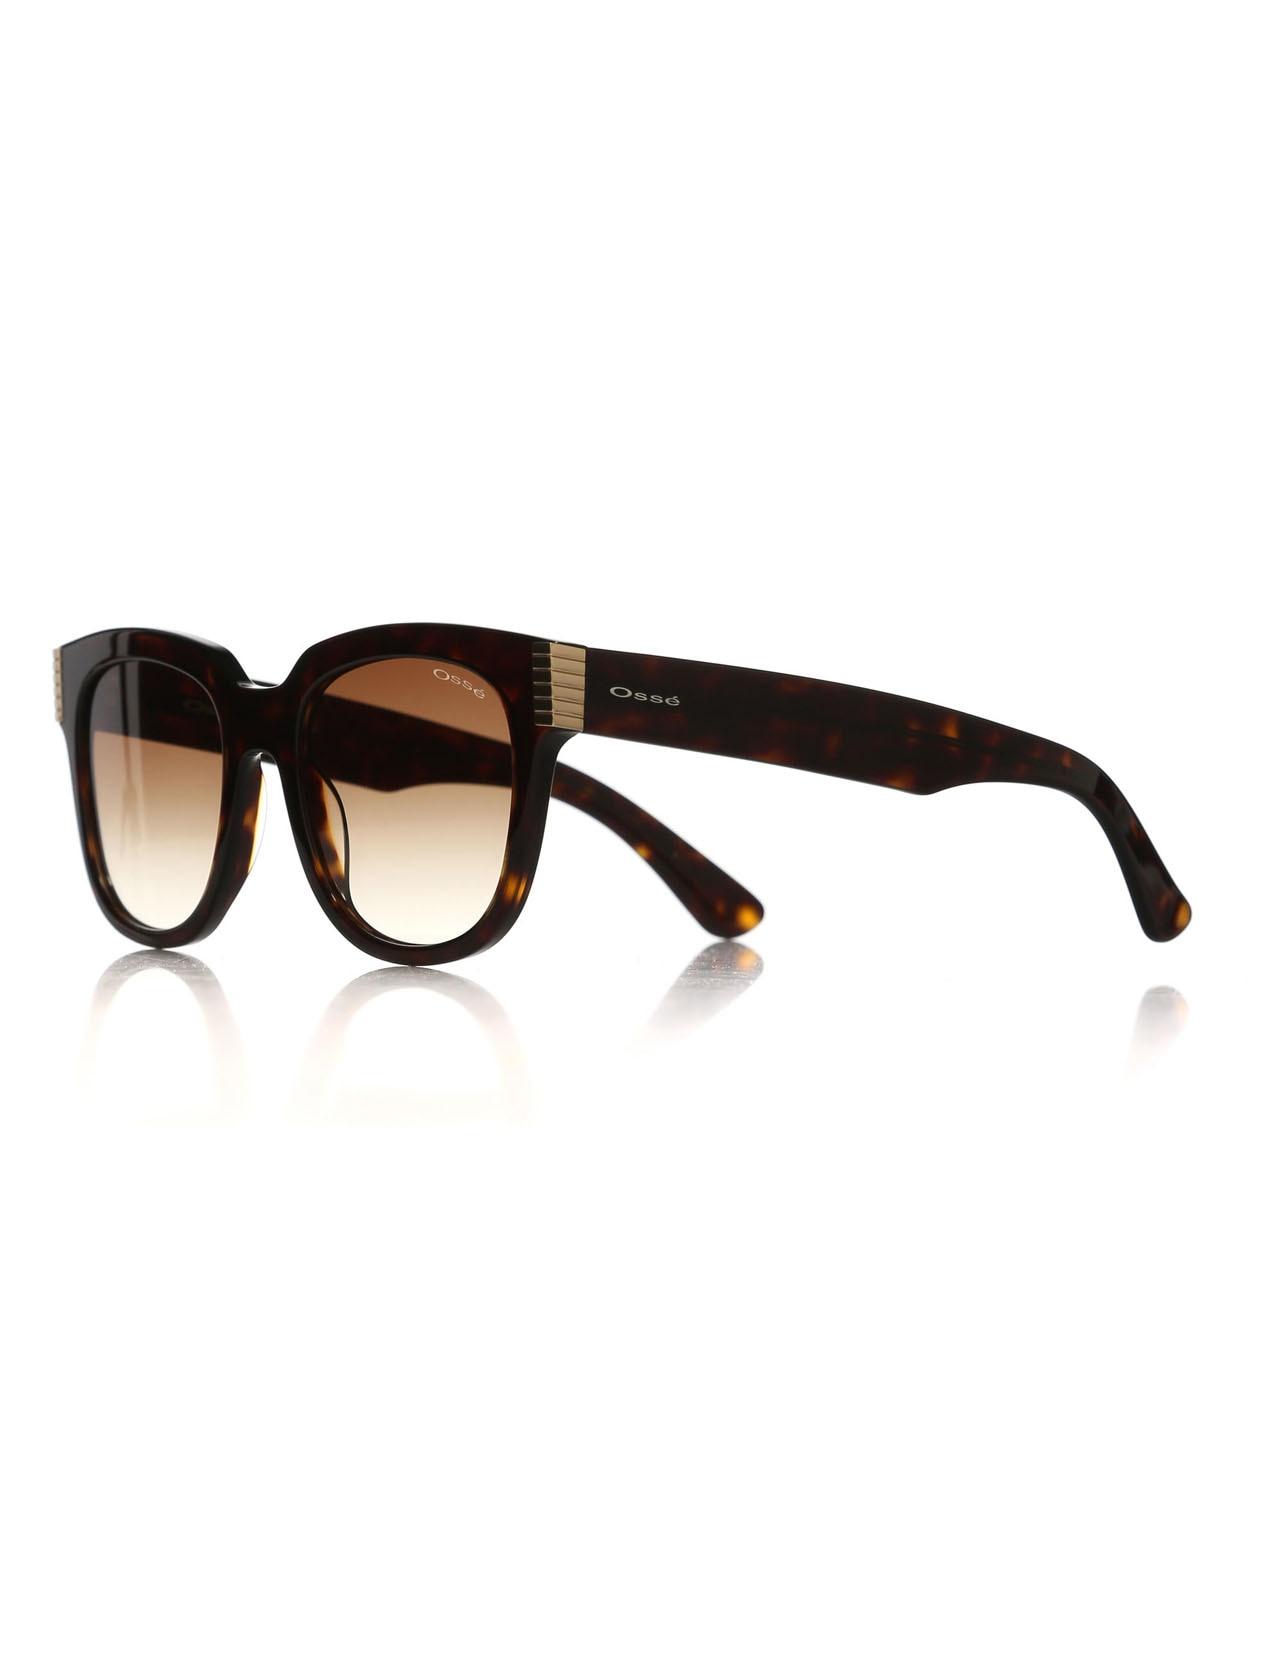 Women's sunglasses os 2150 02 bone Brown organic square square 53-21-147 osse